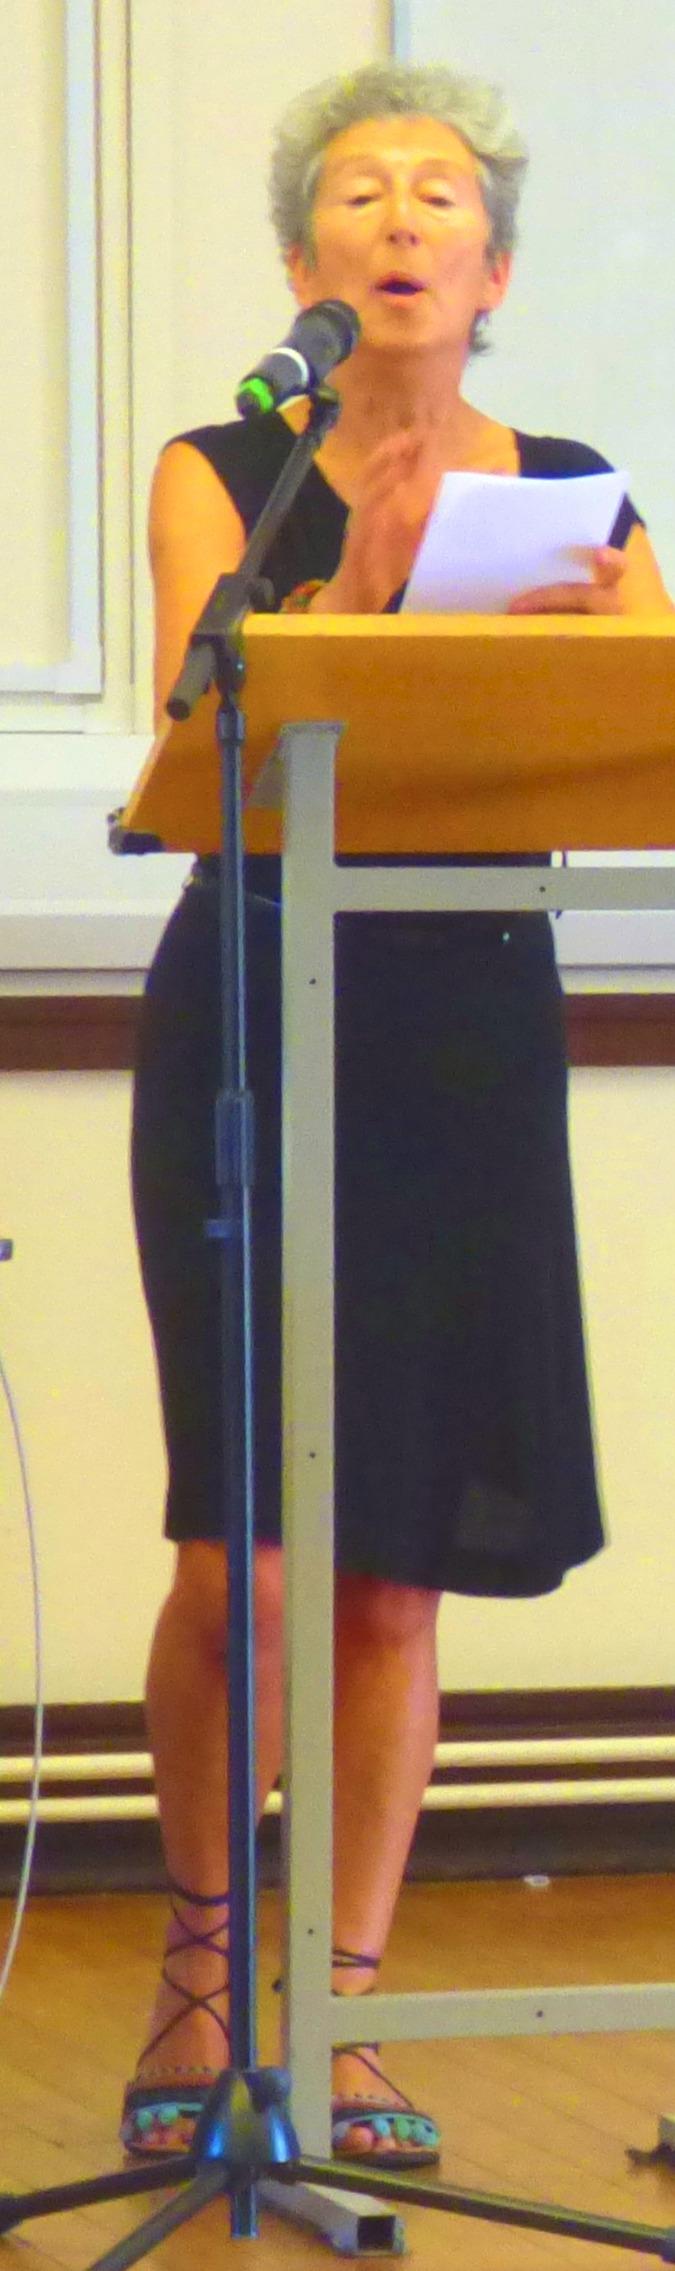 Naomi finishes her speech